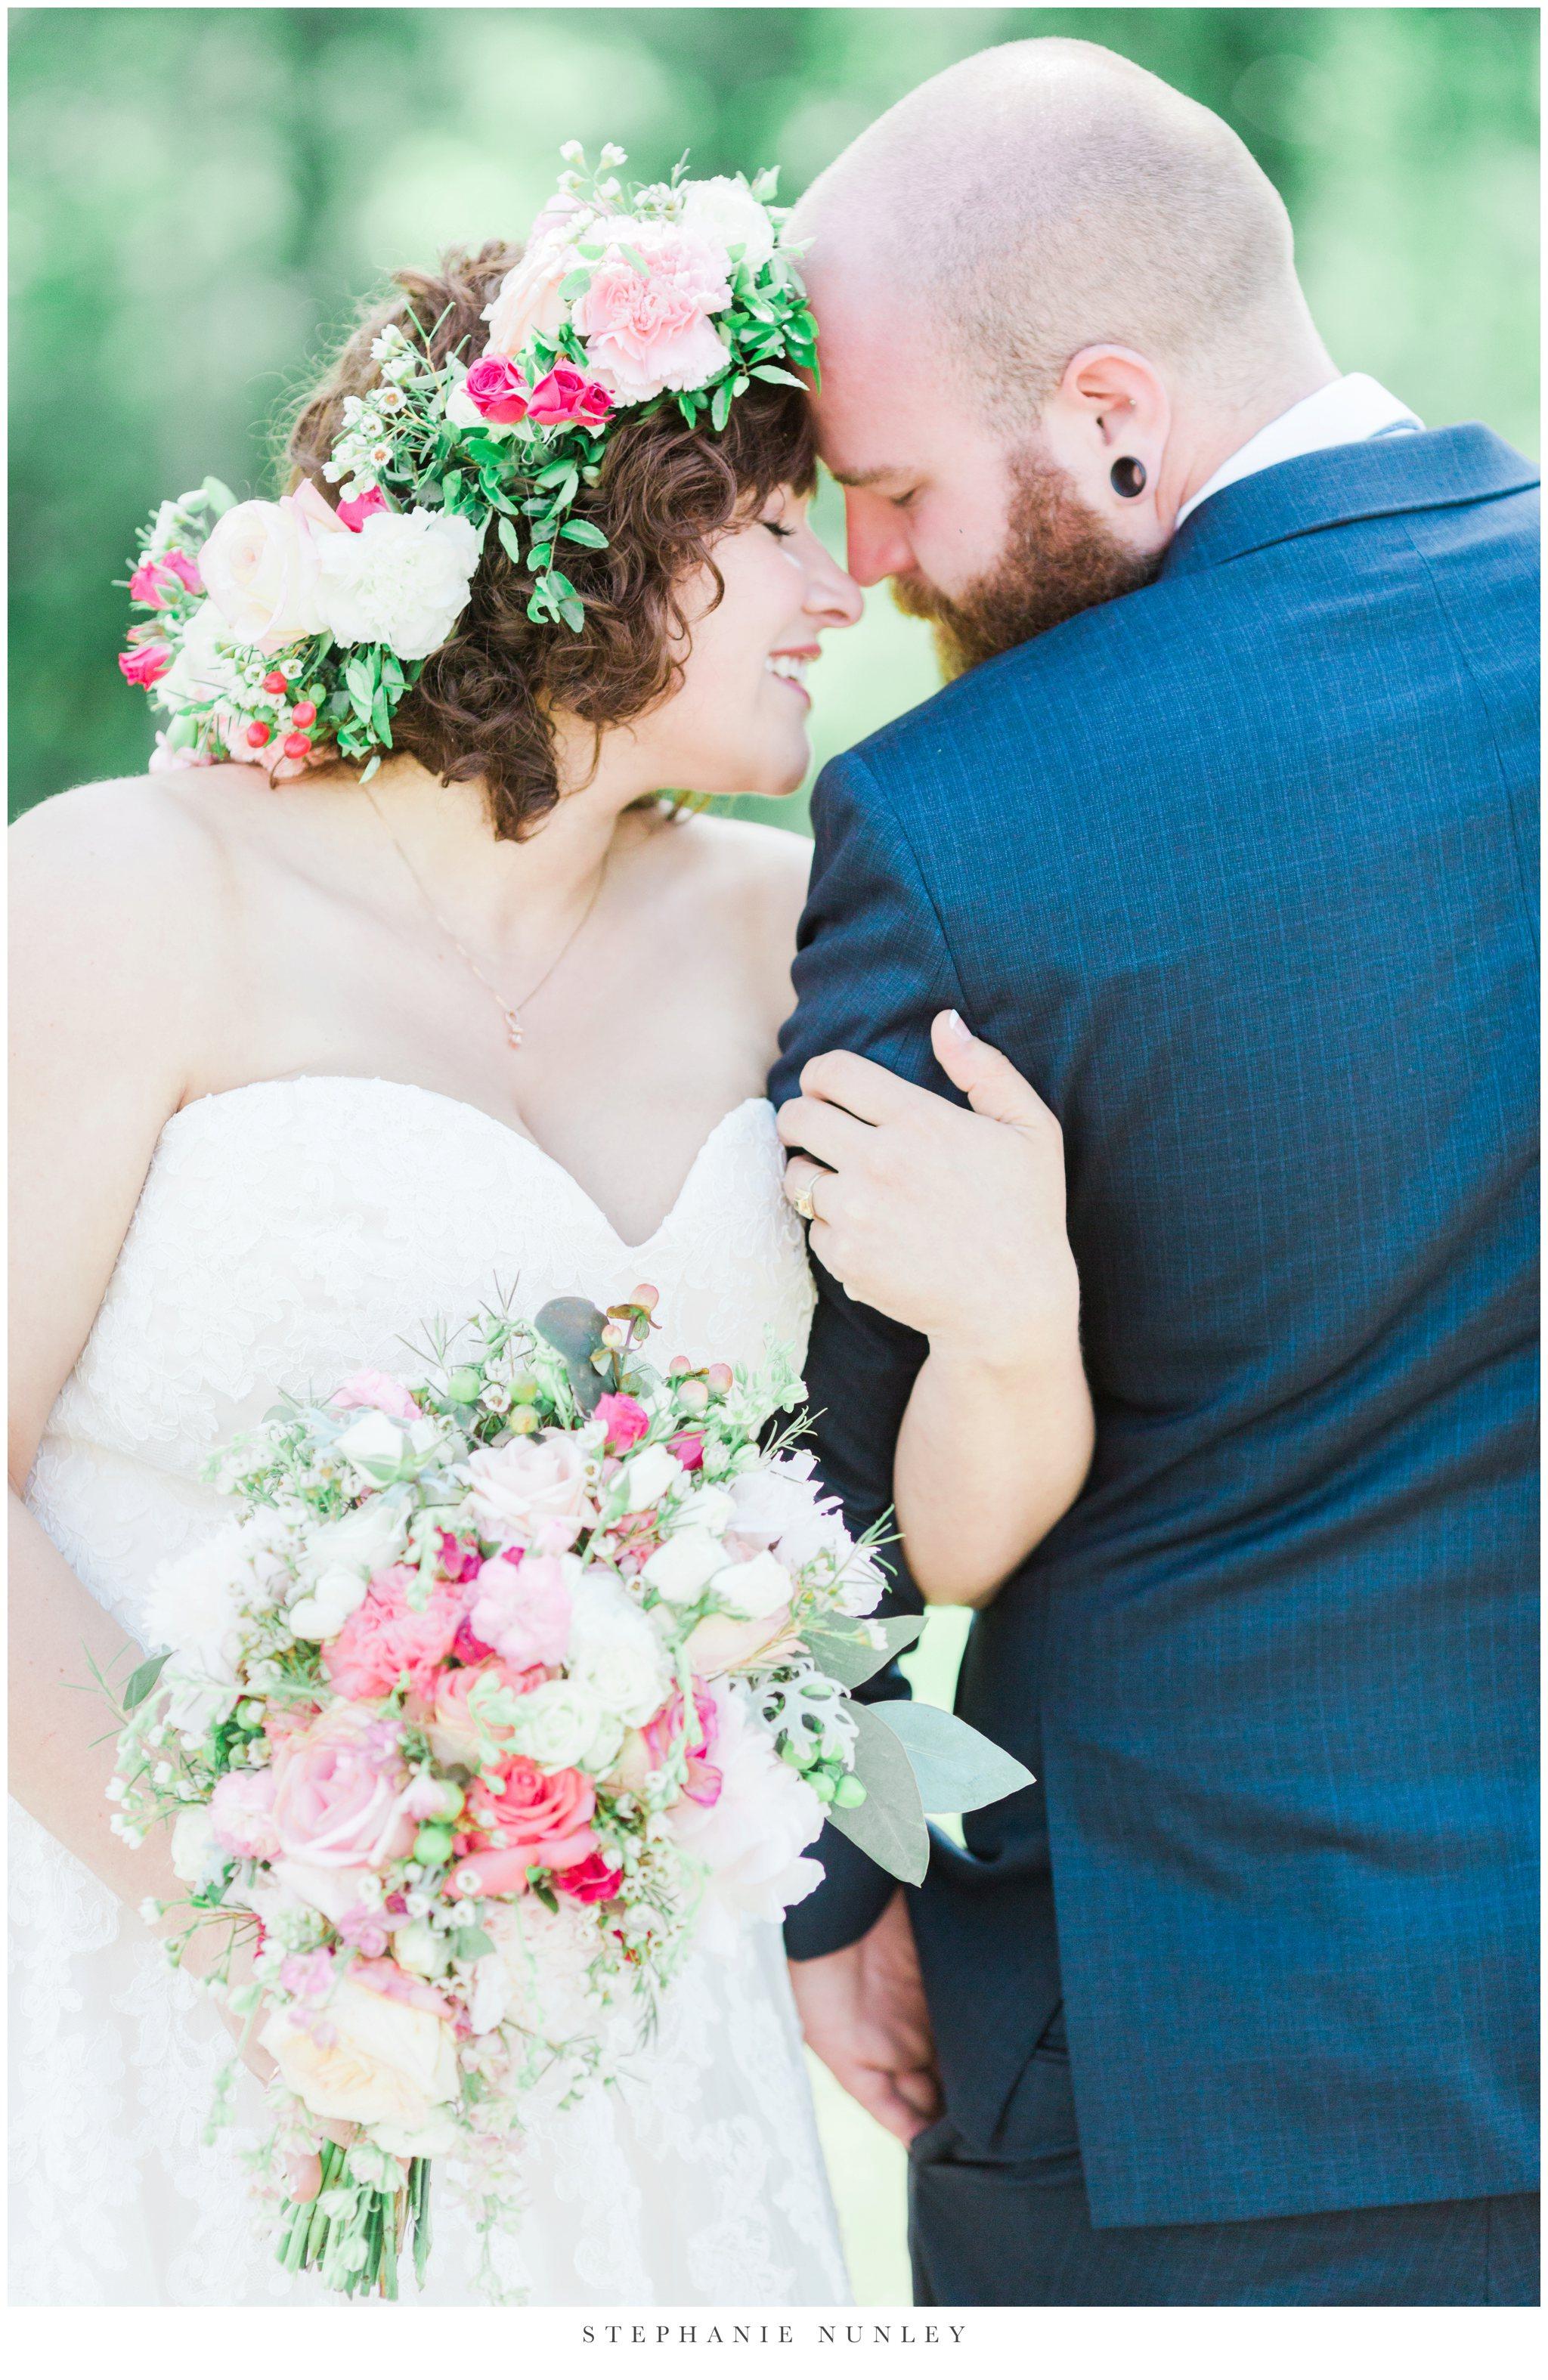 romantic-outdoor-wedding-with-flower-crown-0060.jpg